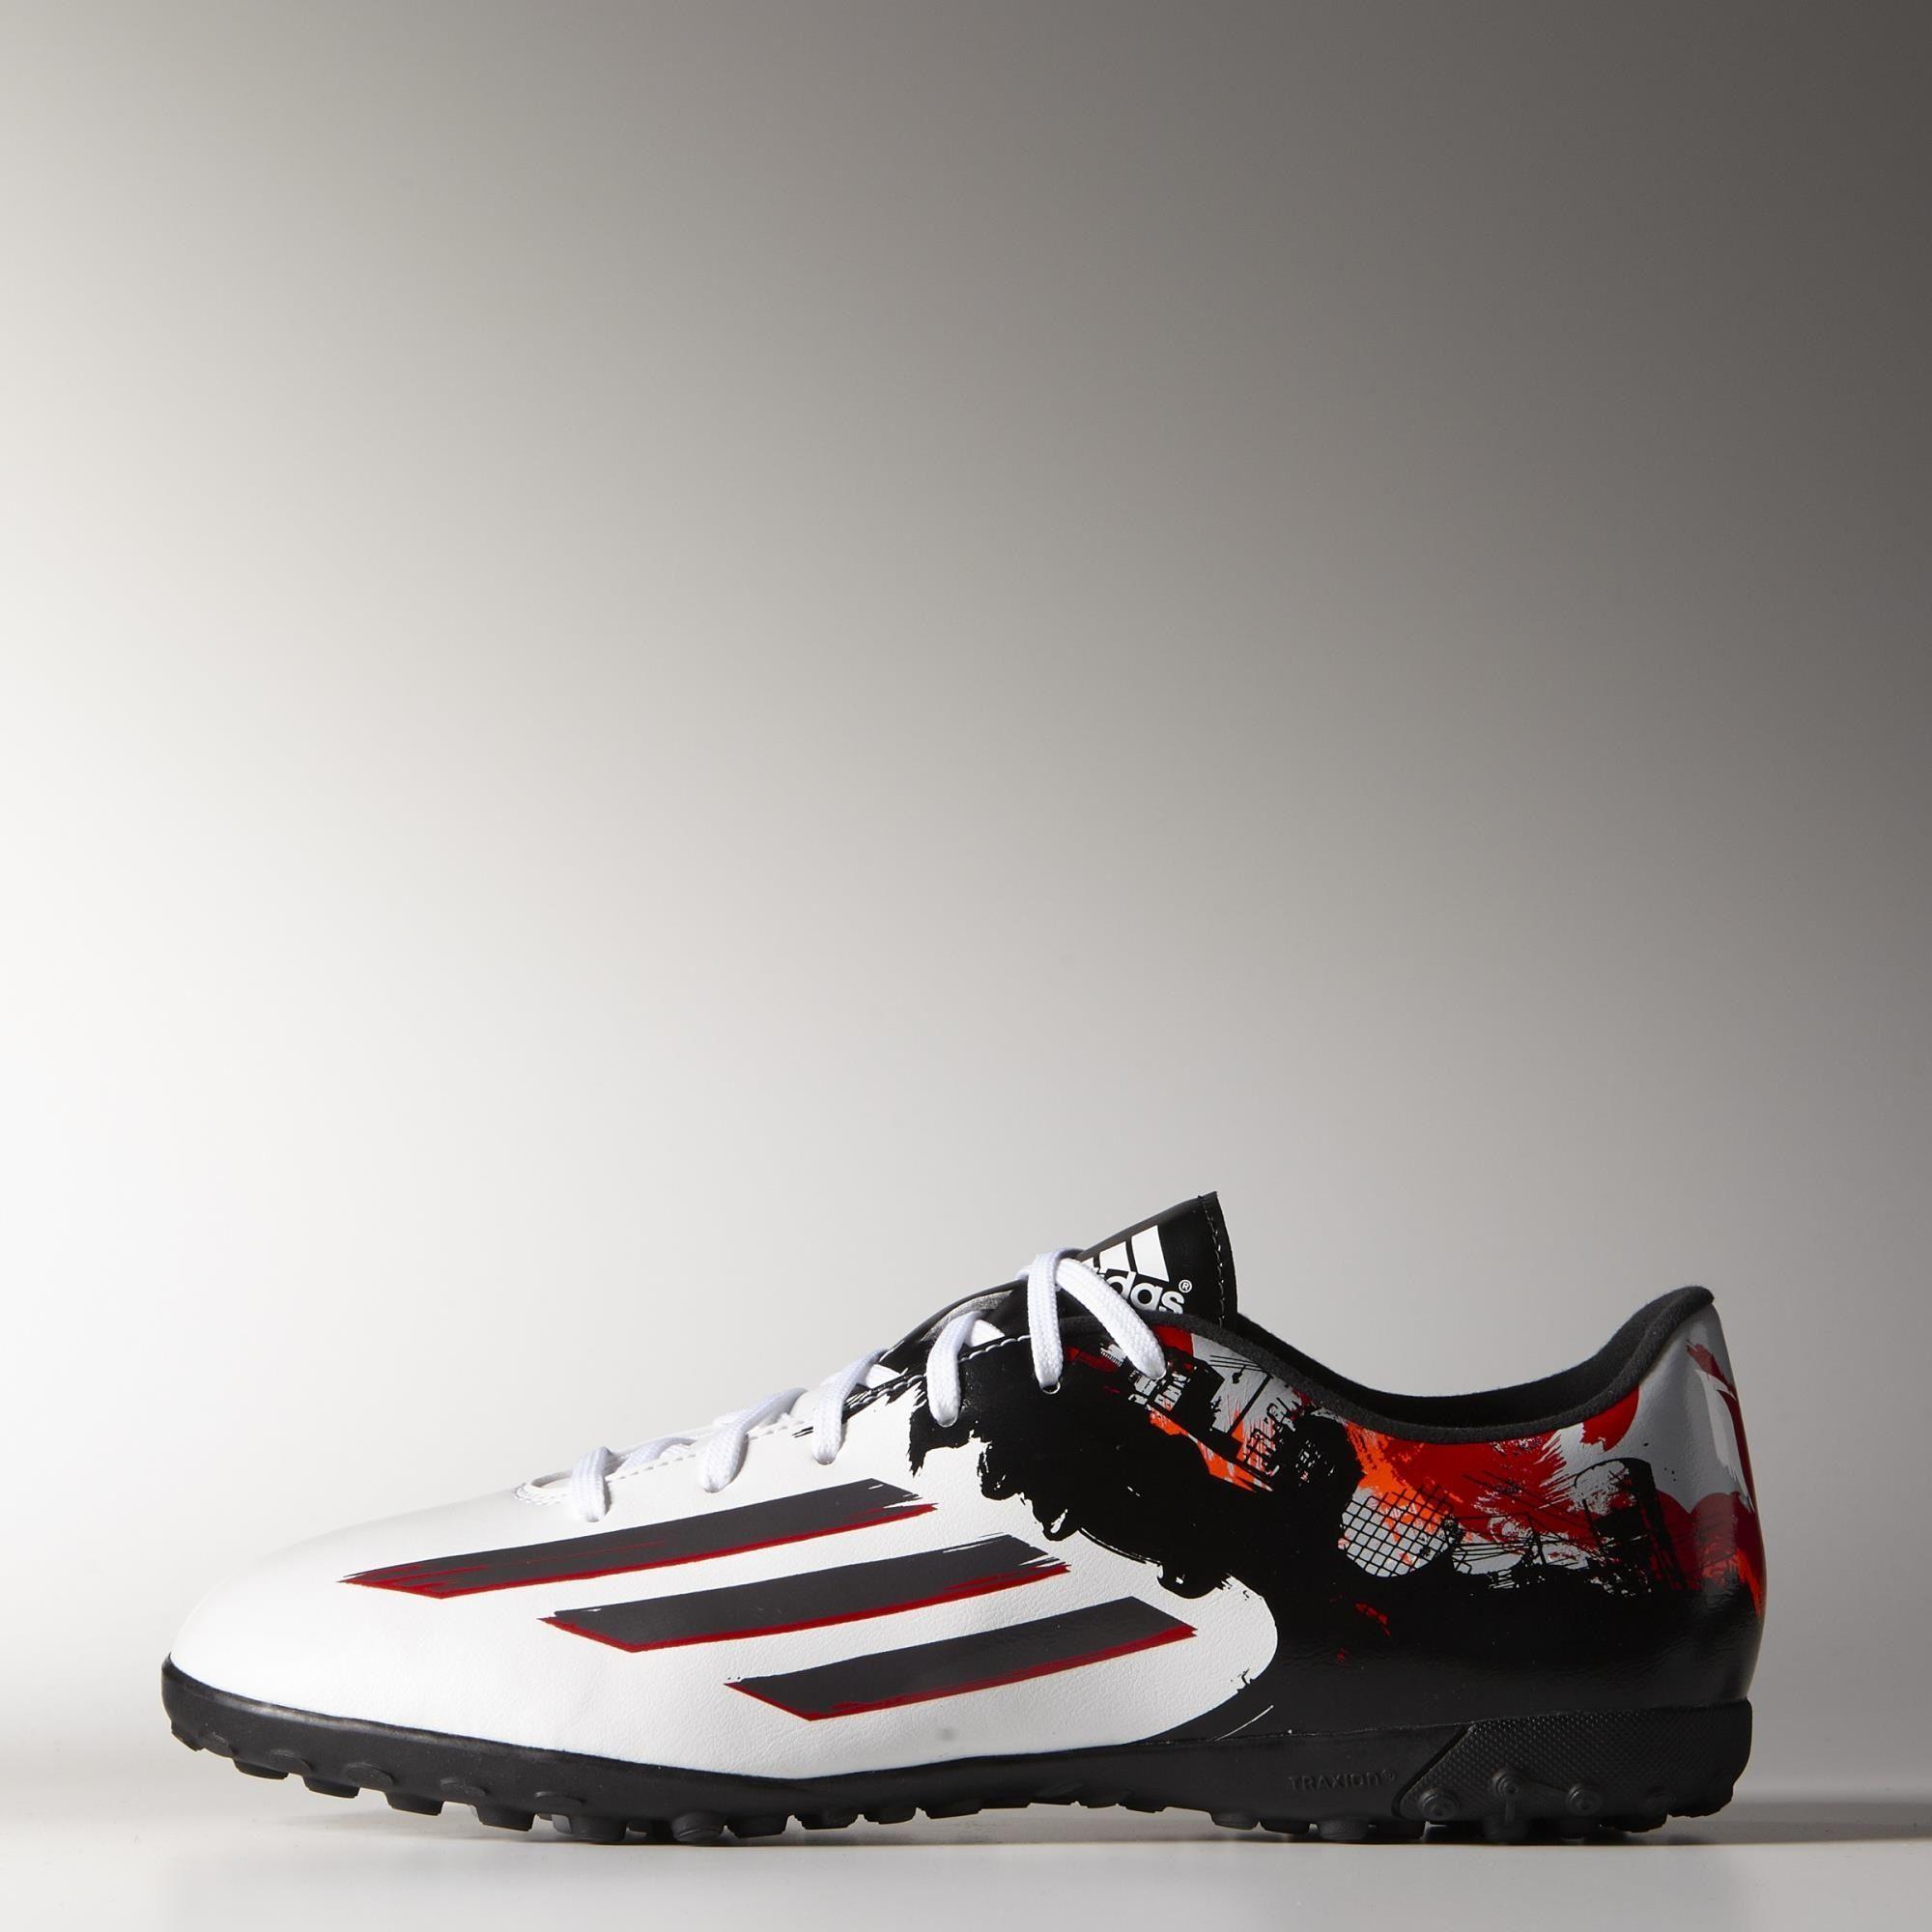 132a17bf13a30 adidas Botines de fútbol Messi 10.3 Césped Artificial - Blanco ...